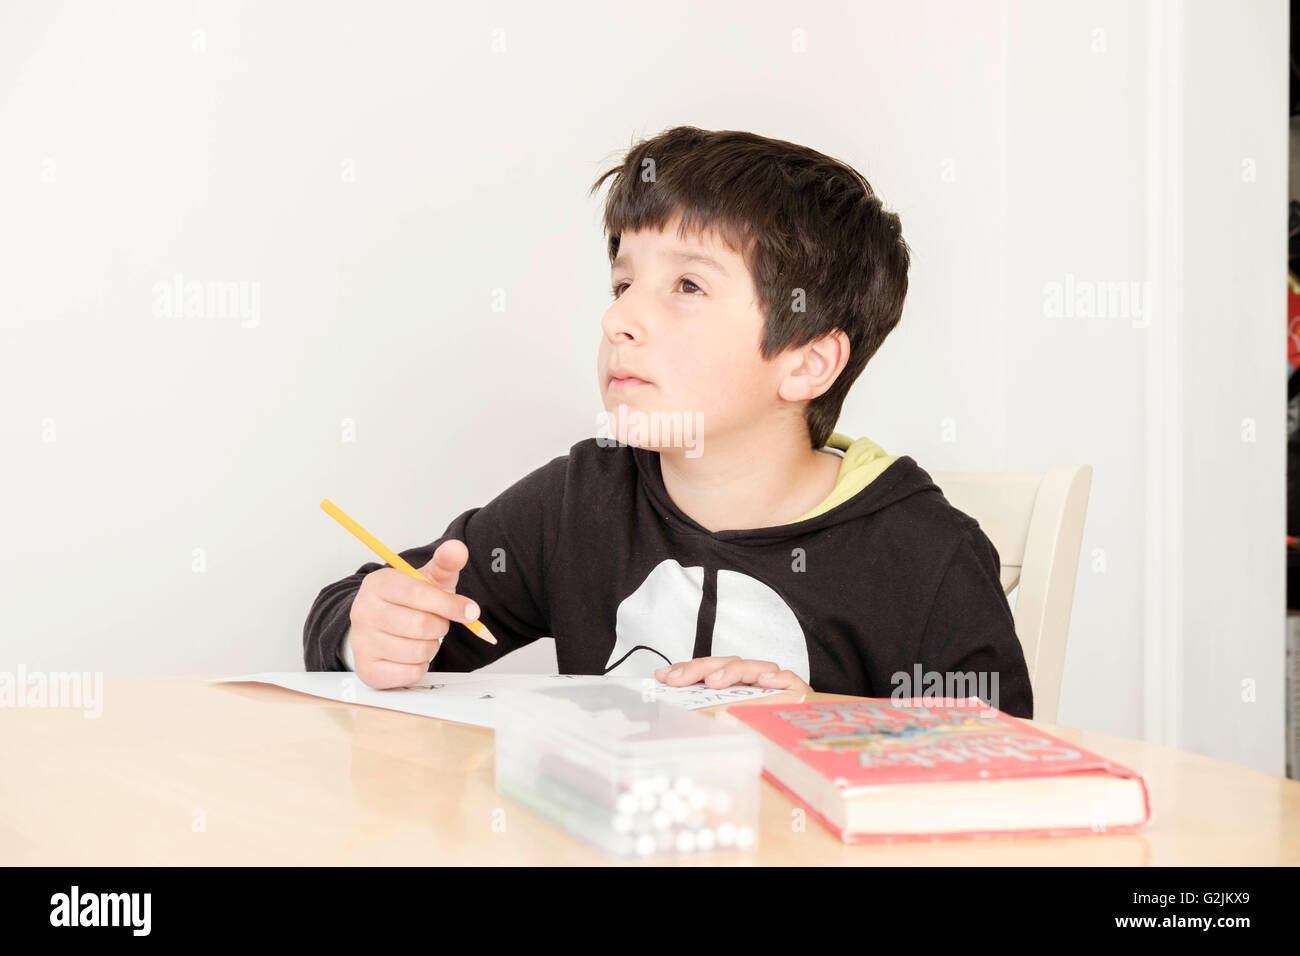 Schoolboy working on his homework - Stock Image